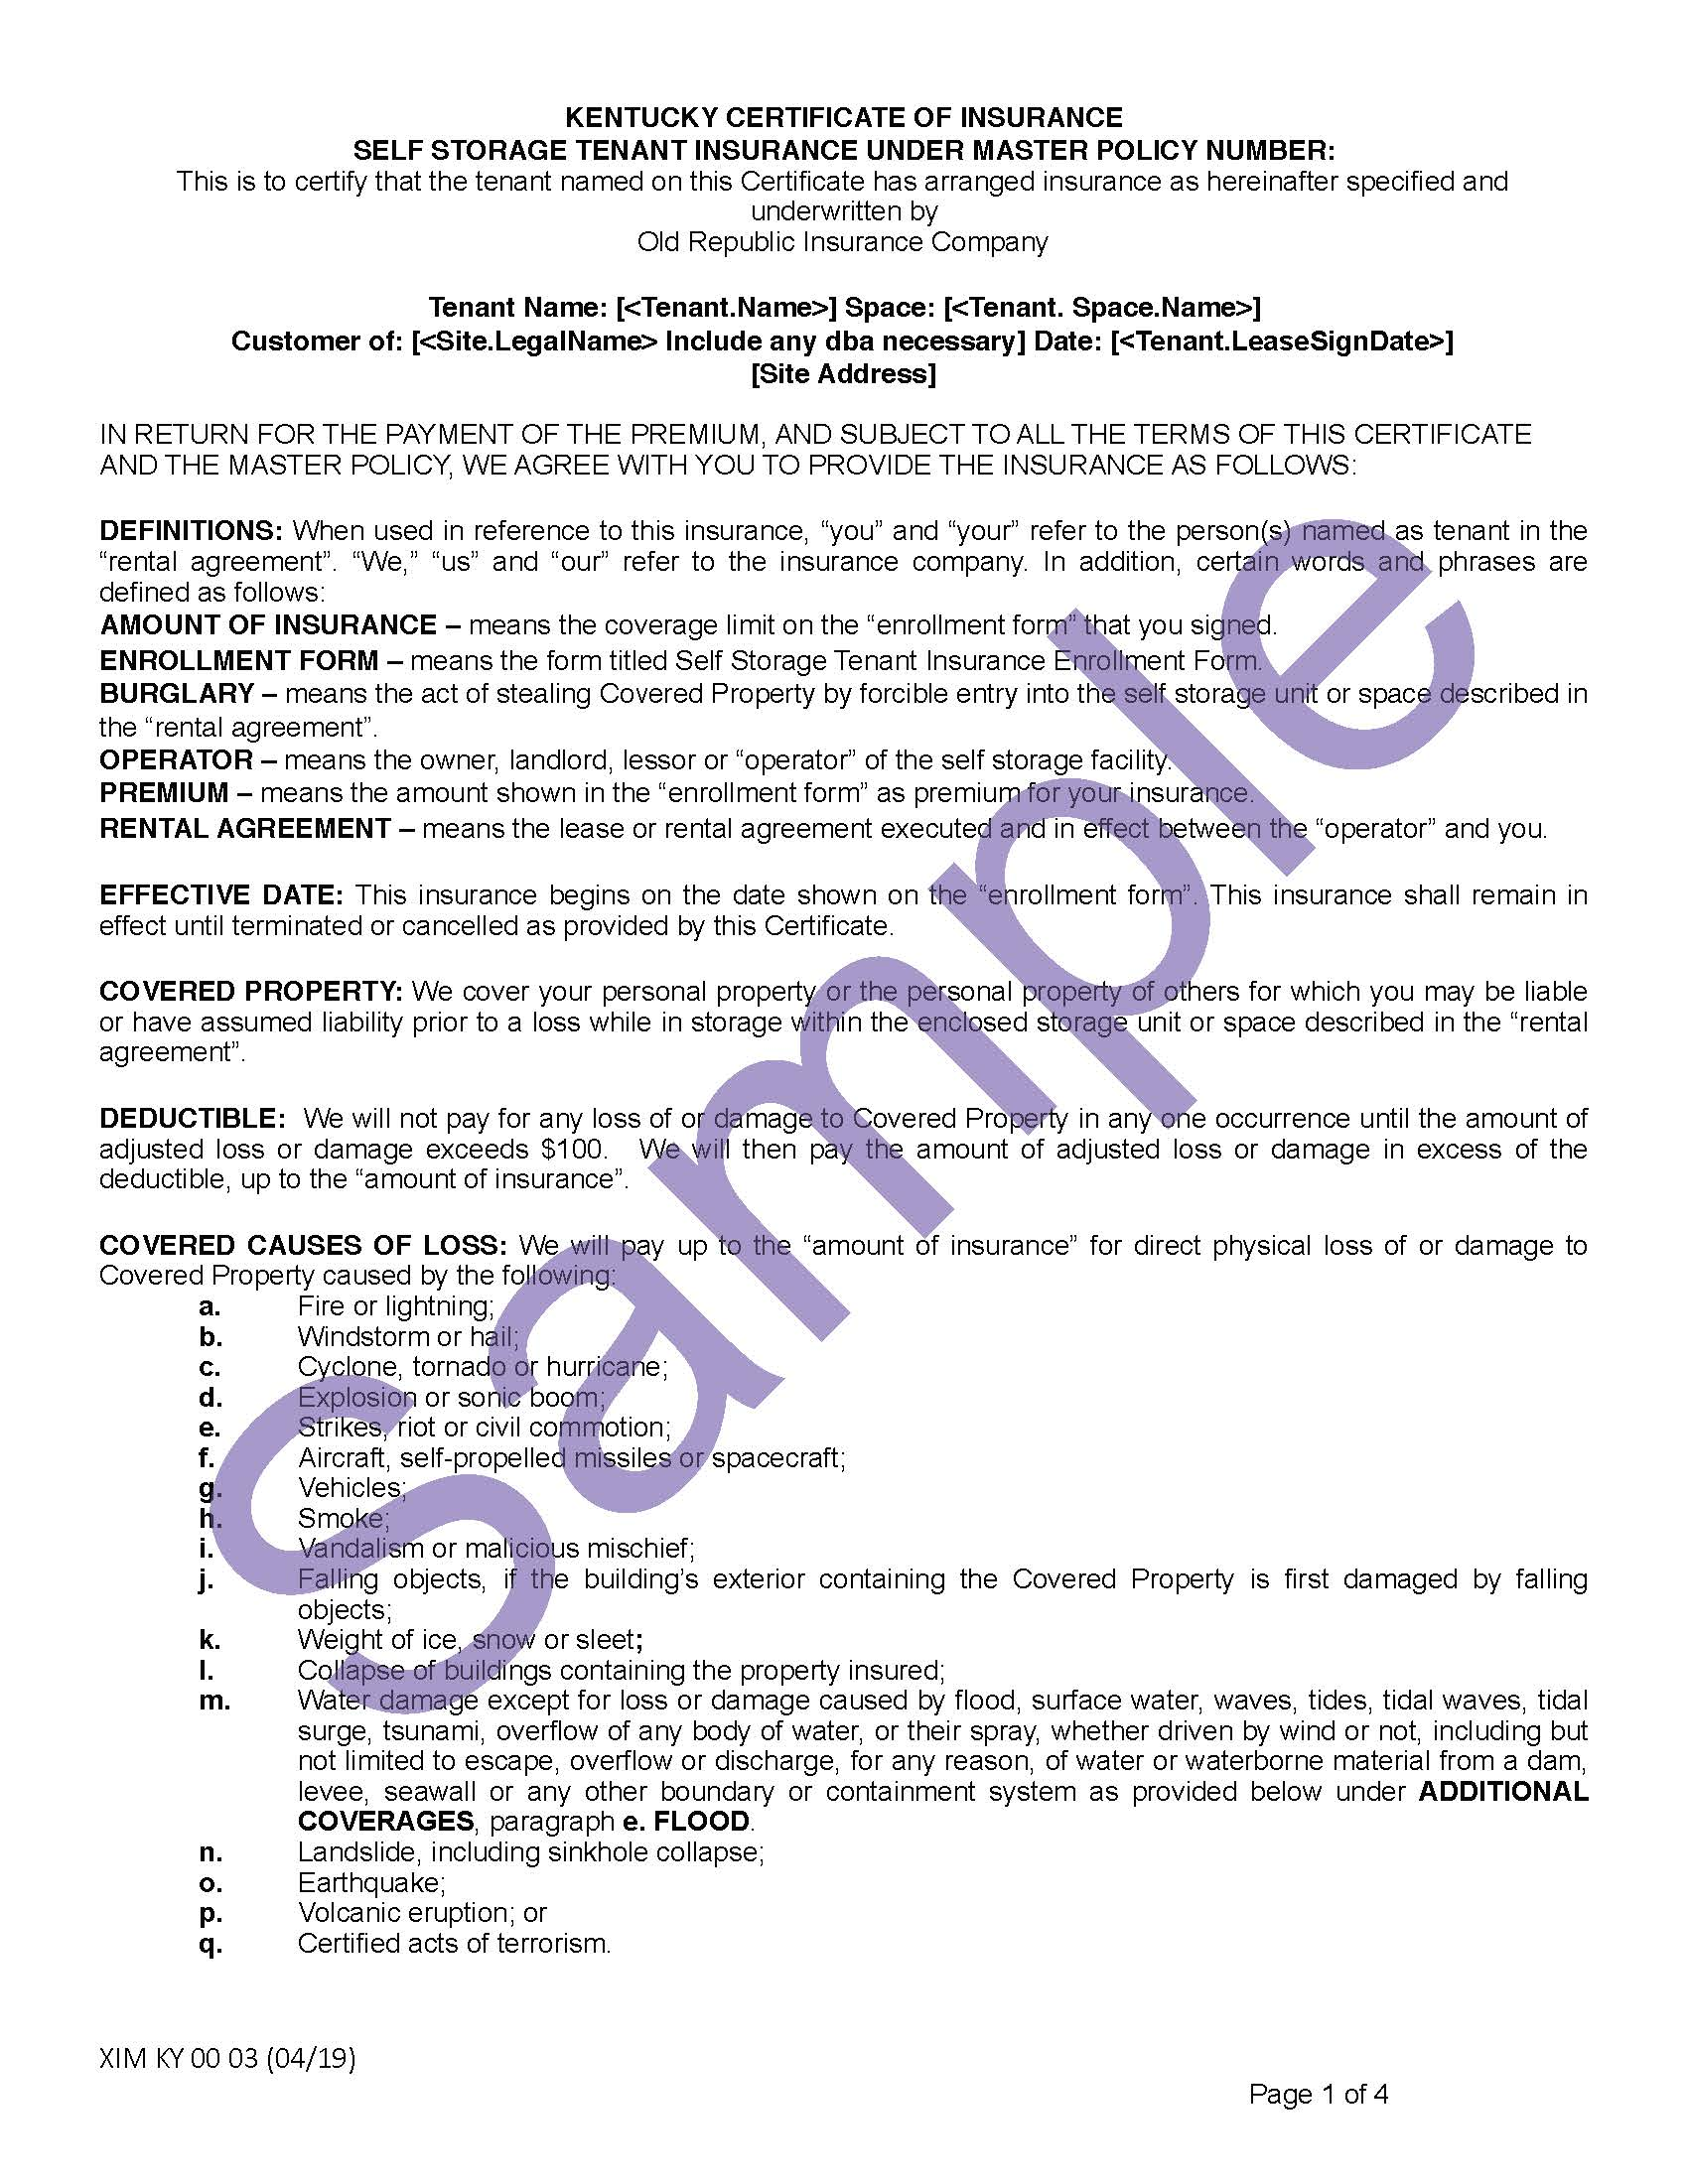 XIM KY 00 03 04 19 Kentucky Certificate of InsuranceSample_Page_1.jpg